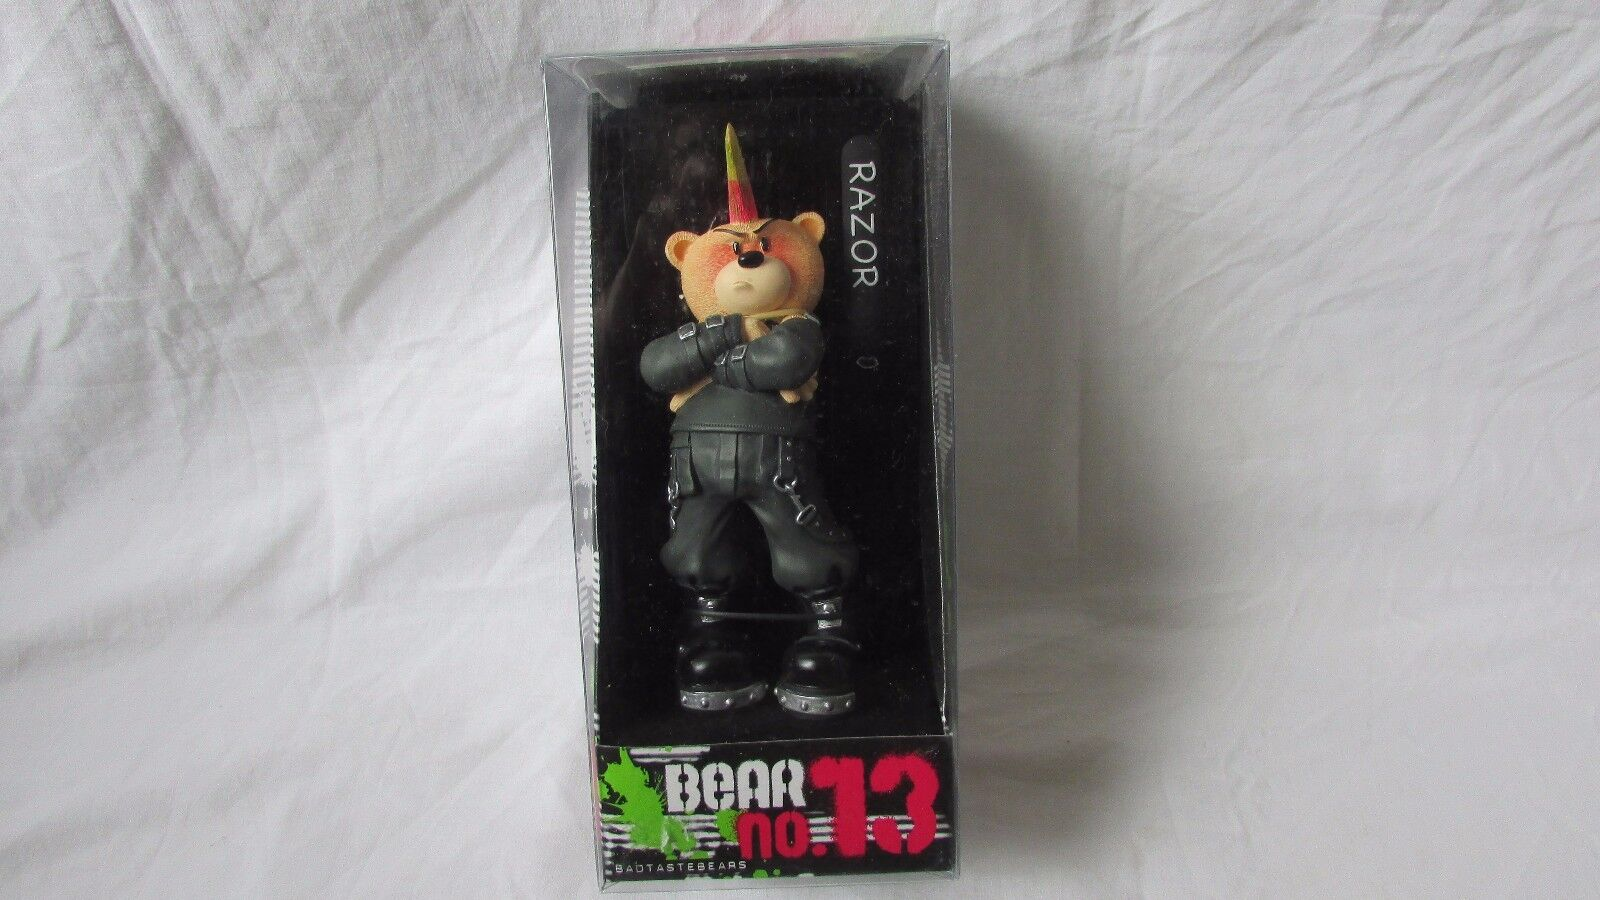 Bad Taste Bears Bears Dolls Amp Bears